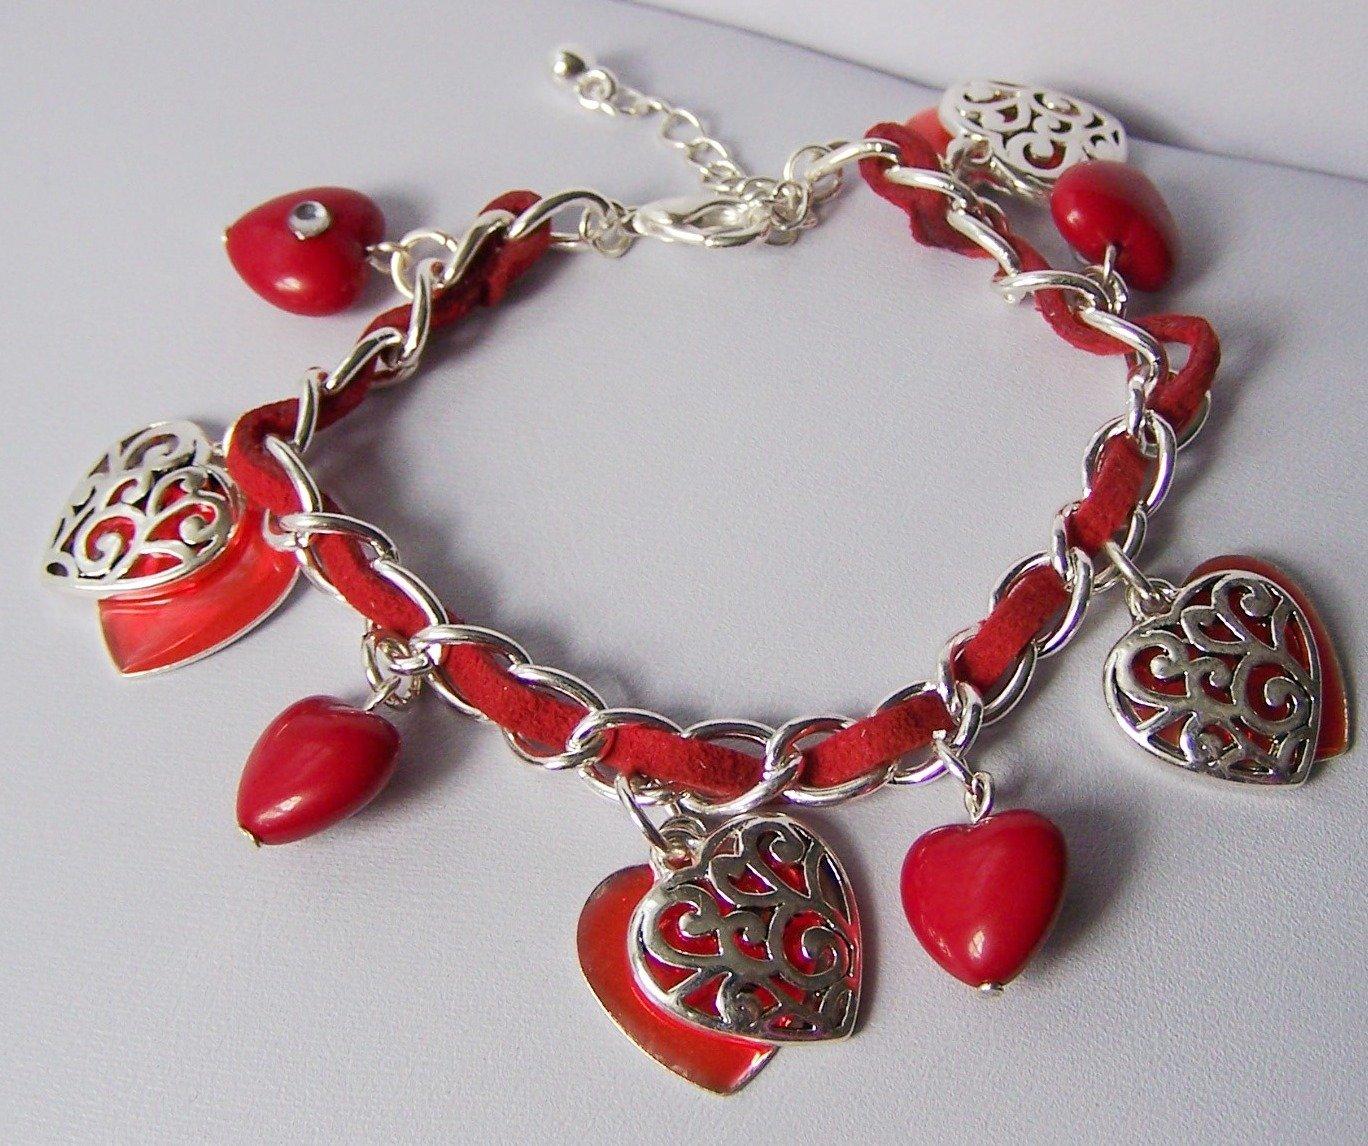 Red Filigree 3D Heart Love Valentines Day Charm Bracelet